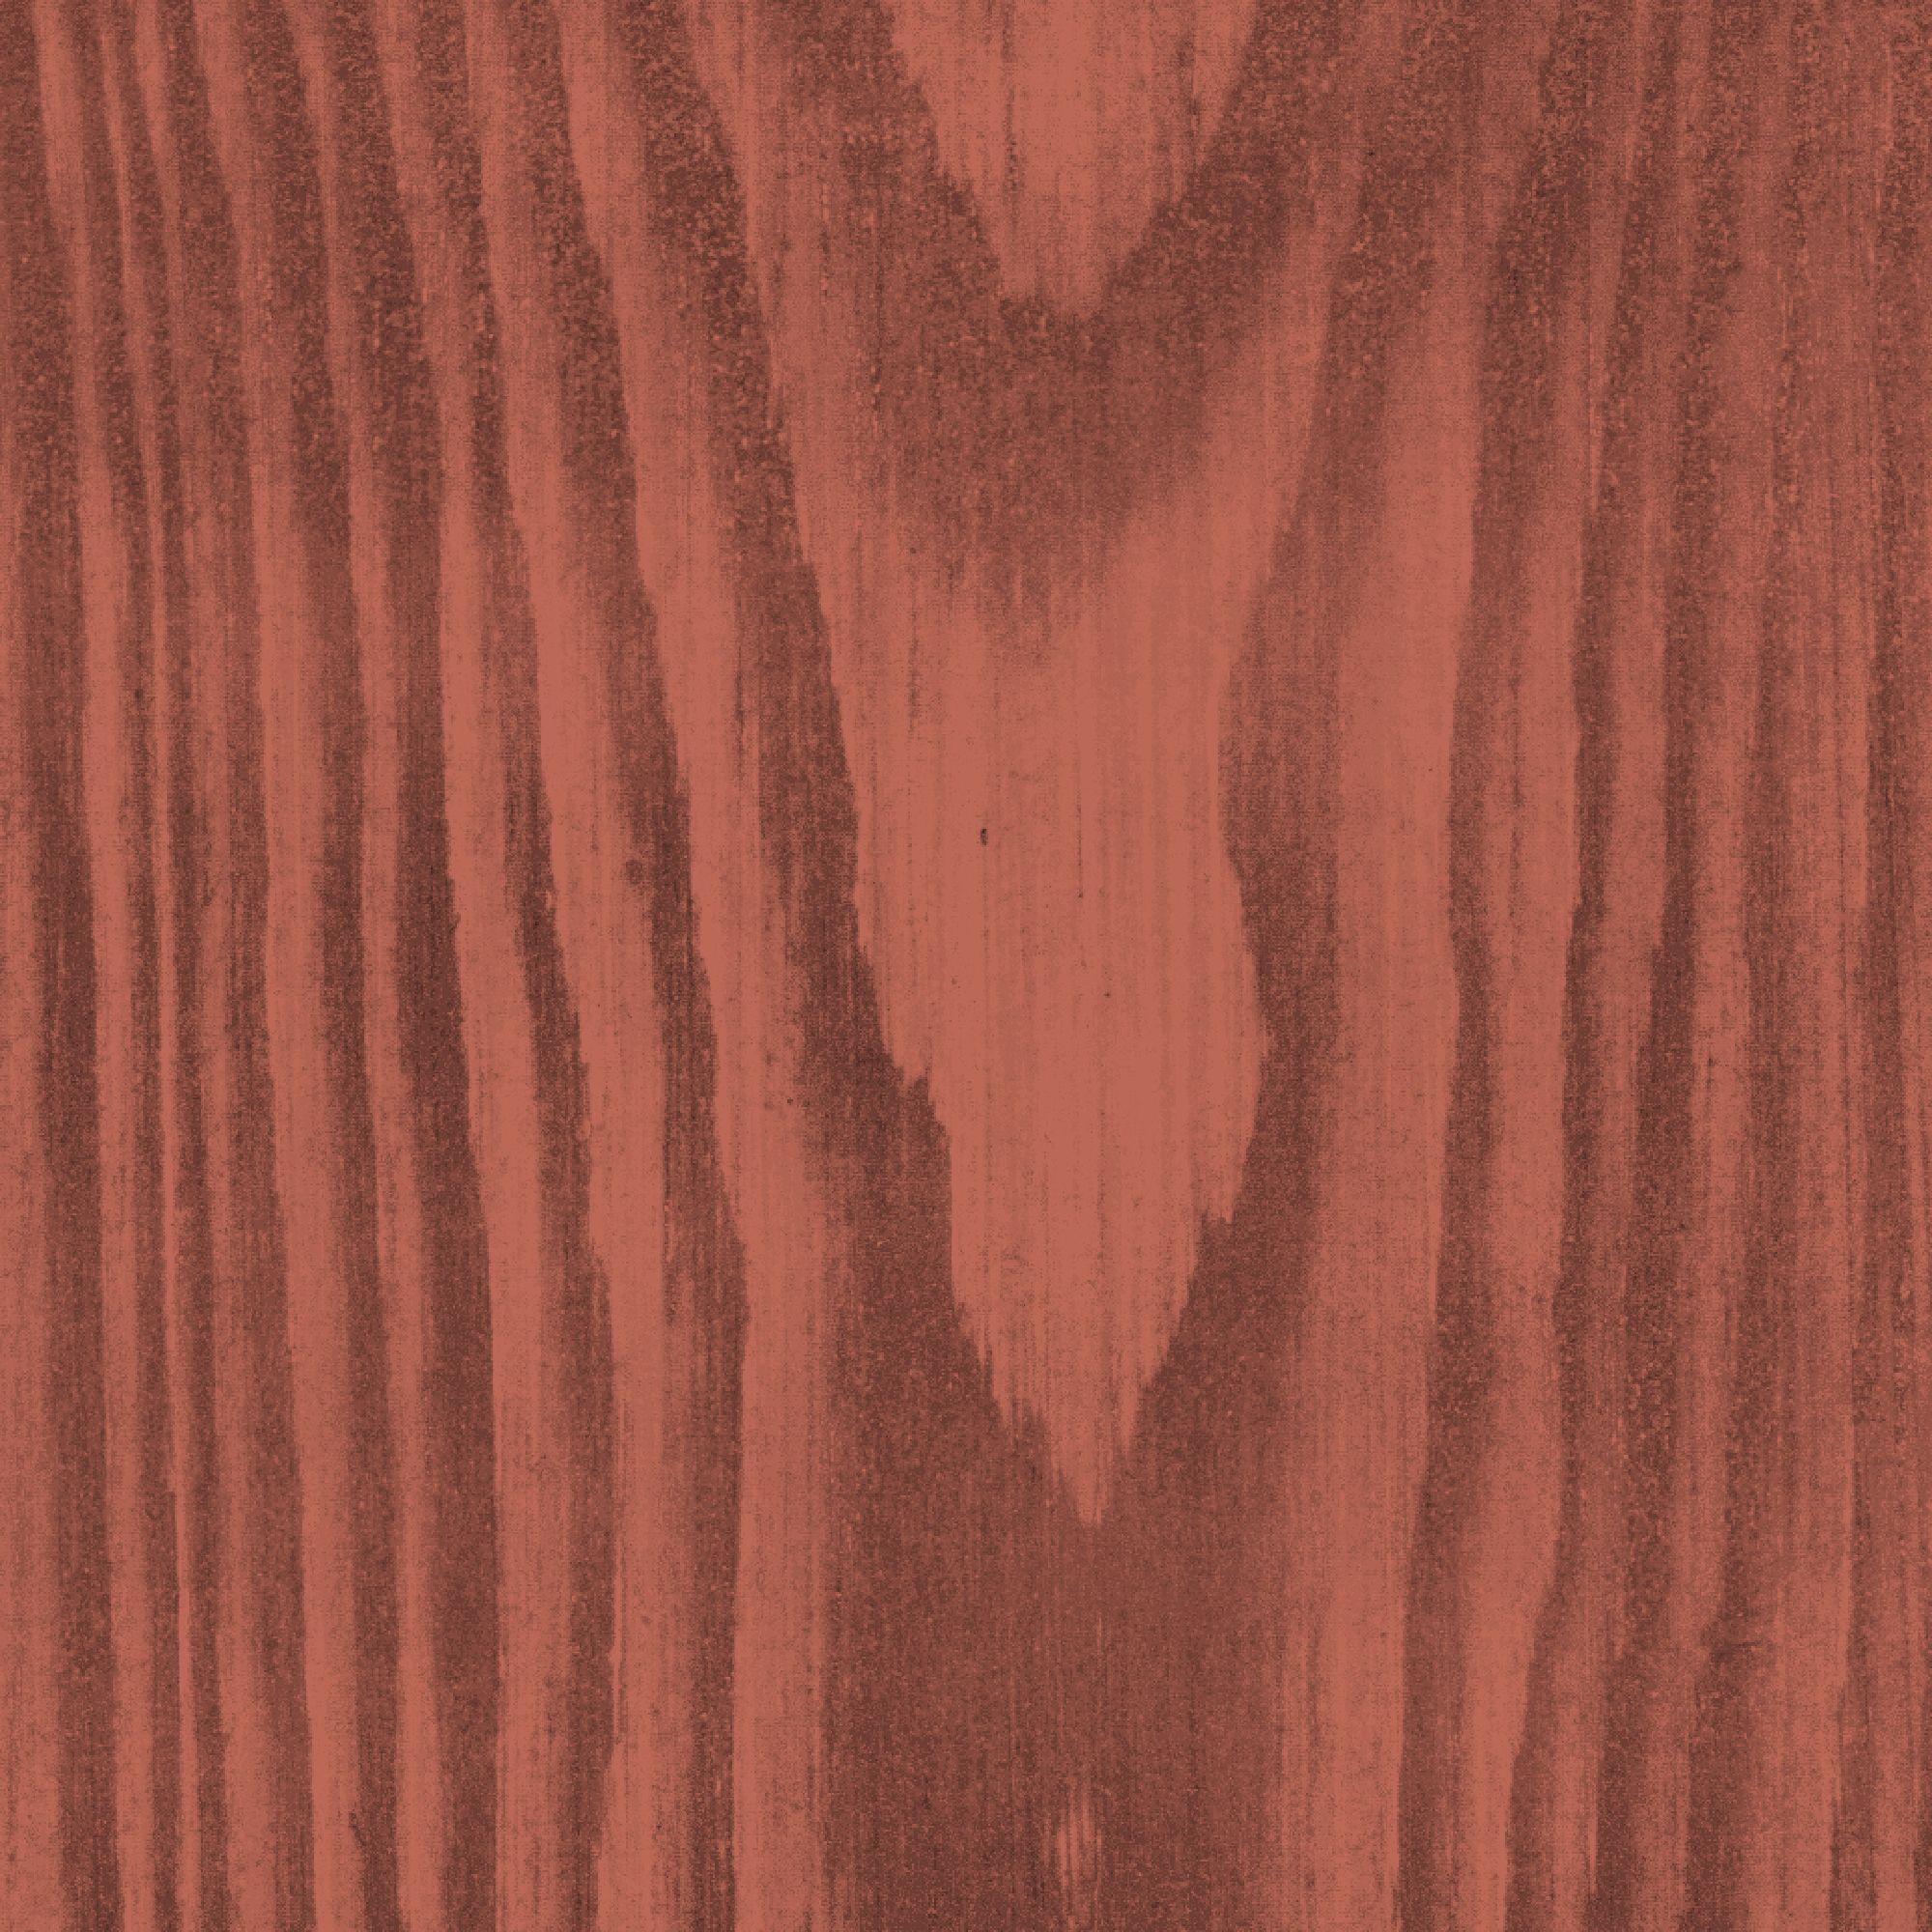 Cuprinol Red Cedar Matt Wood Preserver 4l Departments Diy At B Q